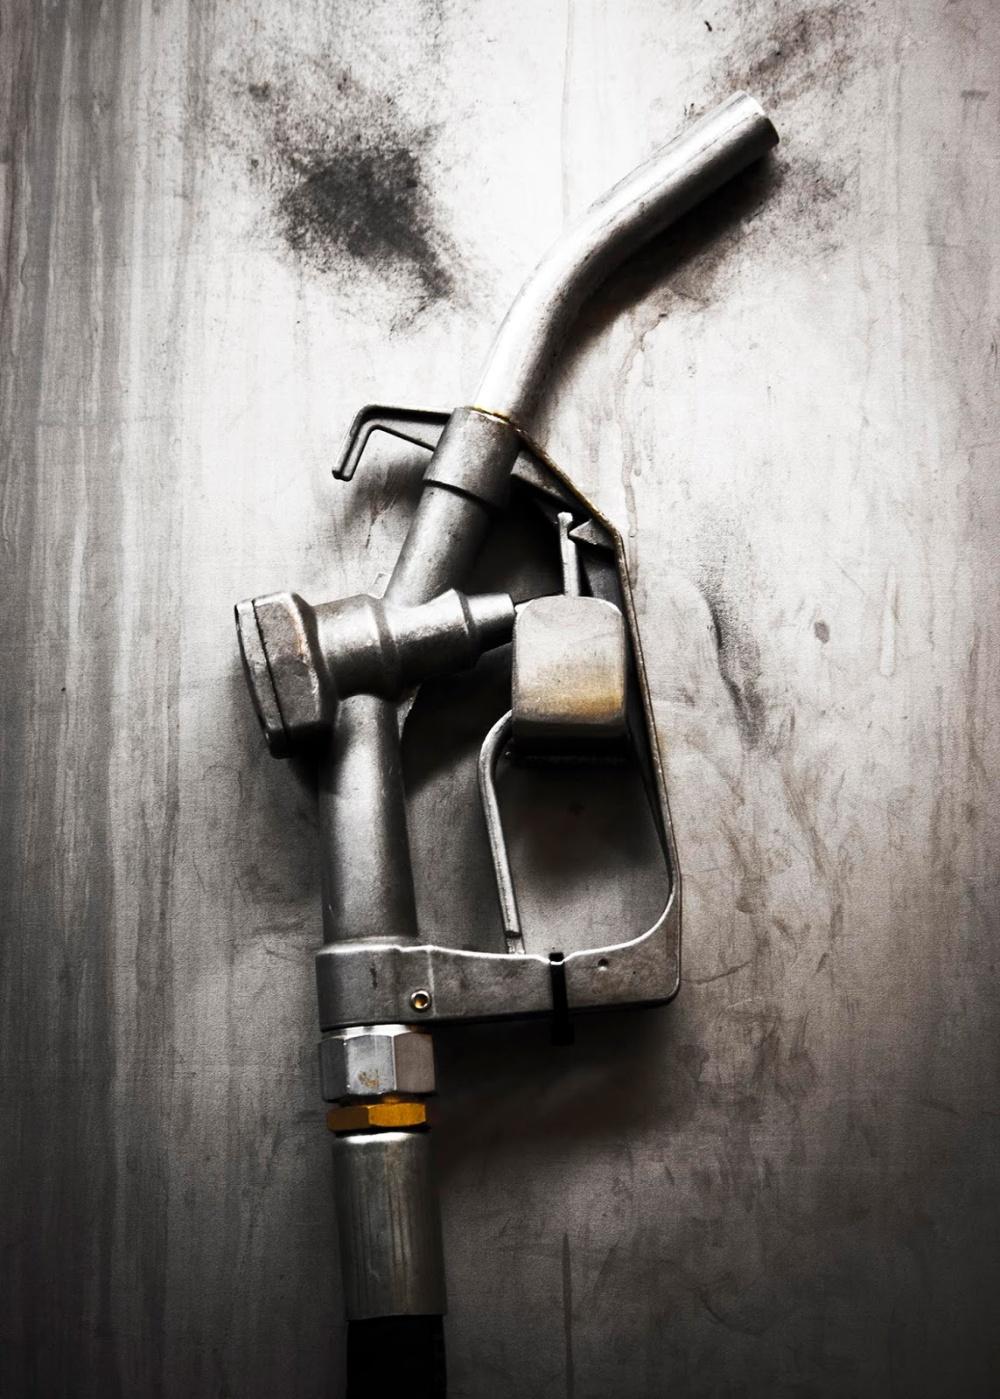 ballindaloch-distillery-scotland-whiskyspeller-2016-15-1